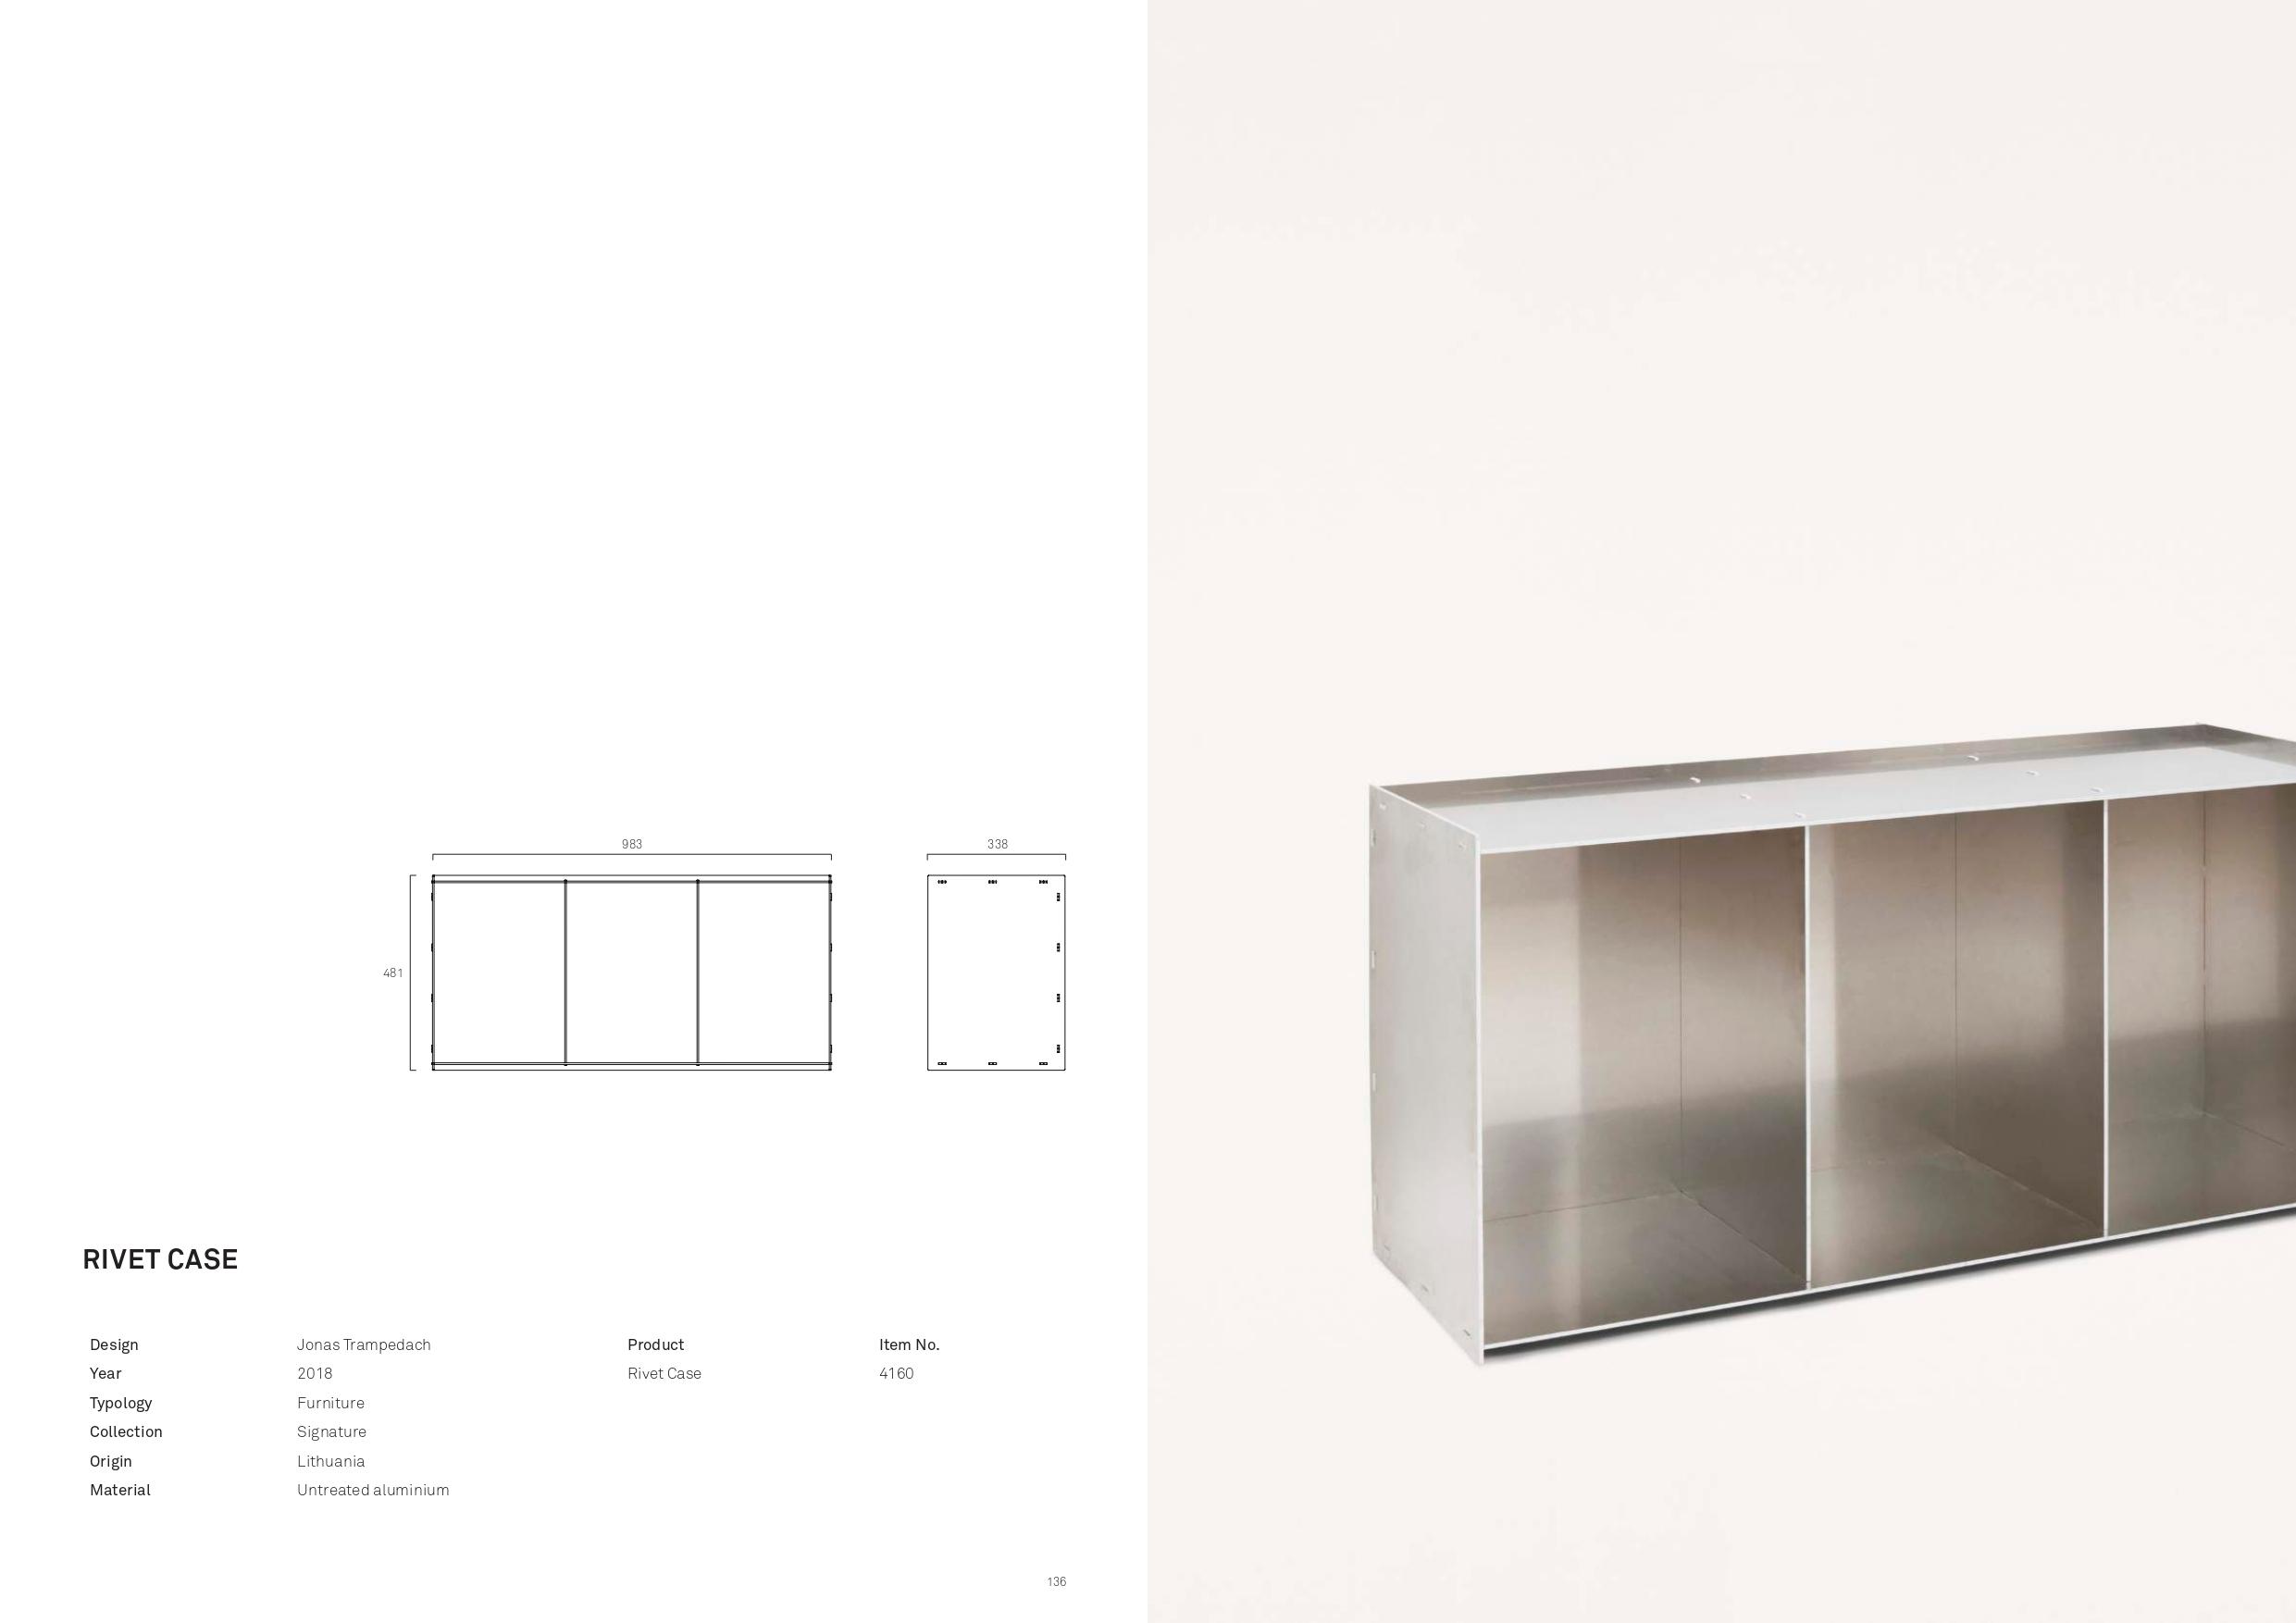 Frama l 2019 l general catalogue_page-0069.jpg